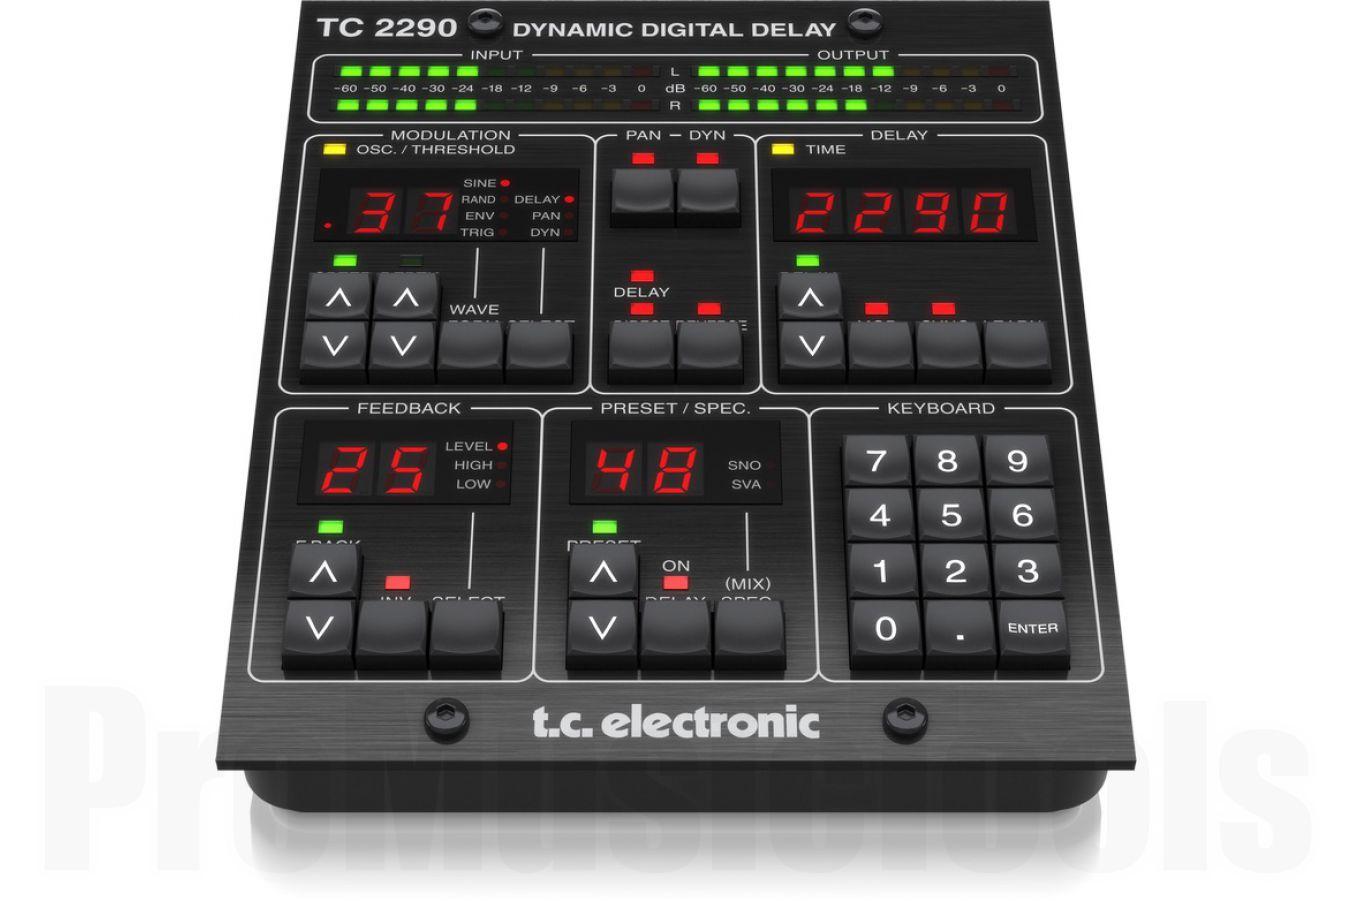 TC Electronic TC2290-DT Dynamic Digital Delay Plug-In + Desktop Controller